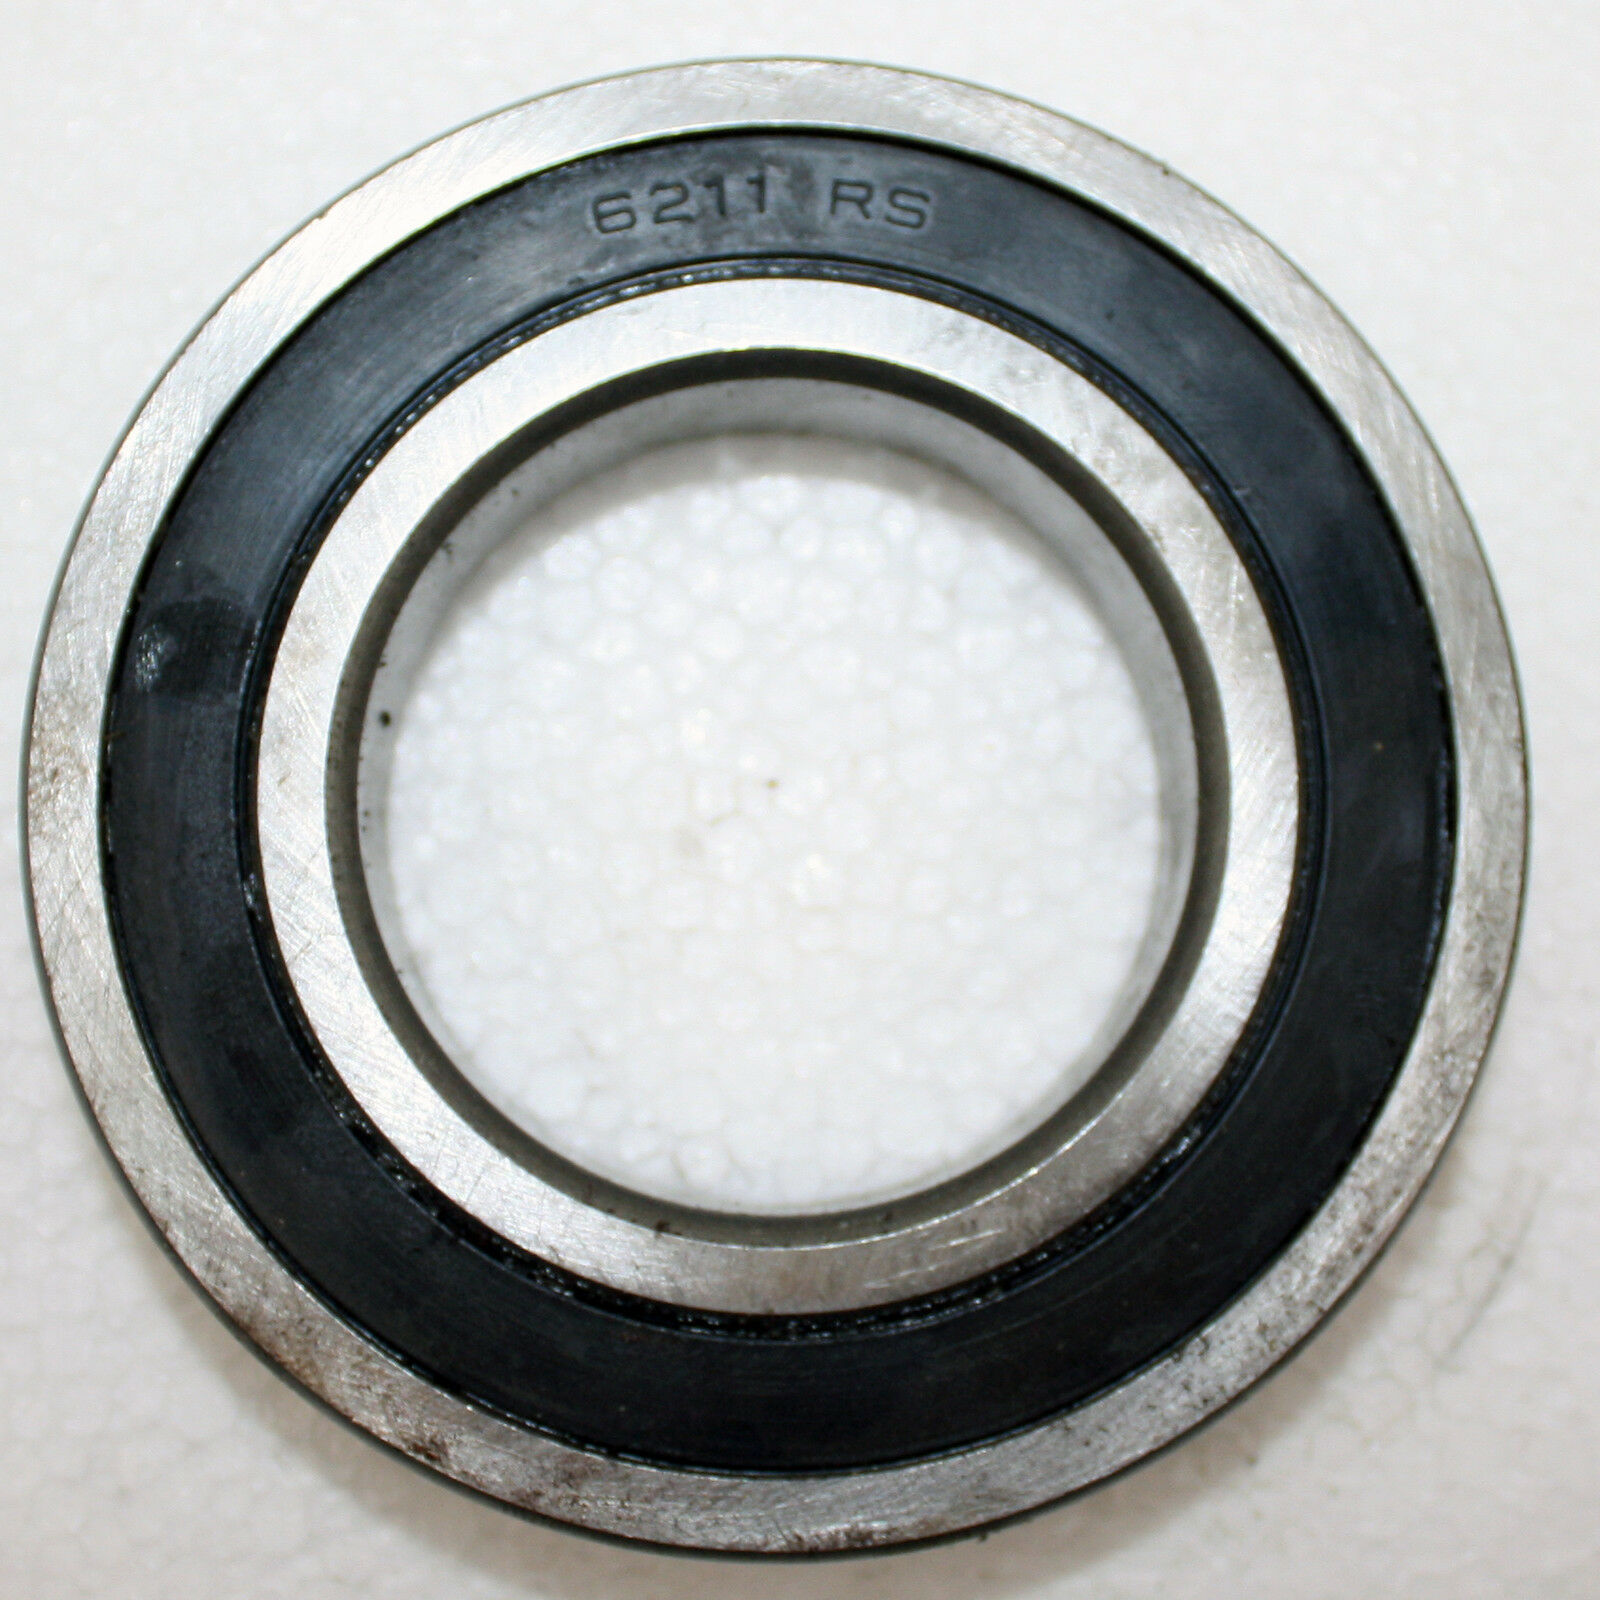 10 PCS 6201-2RS Rubber Sealed Ball Bearing Set BLACK 6201RS 12x32x10 mm